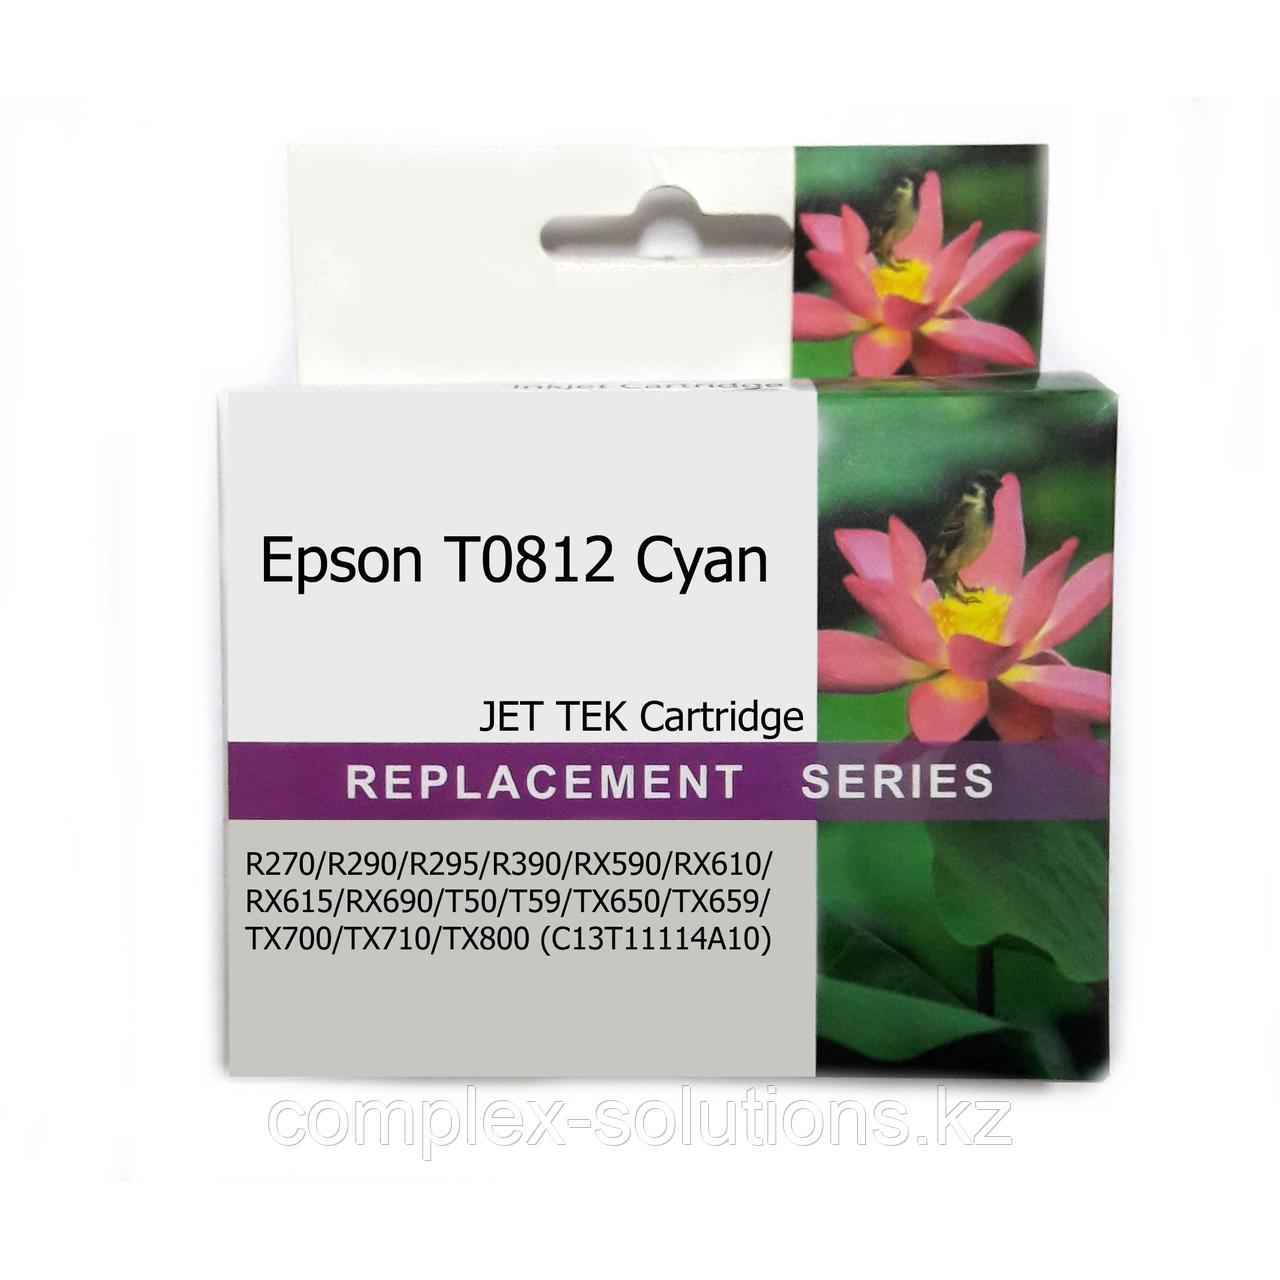 Картридж EPSON T0812 Cyan JET TEK | [качественный дубликат]